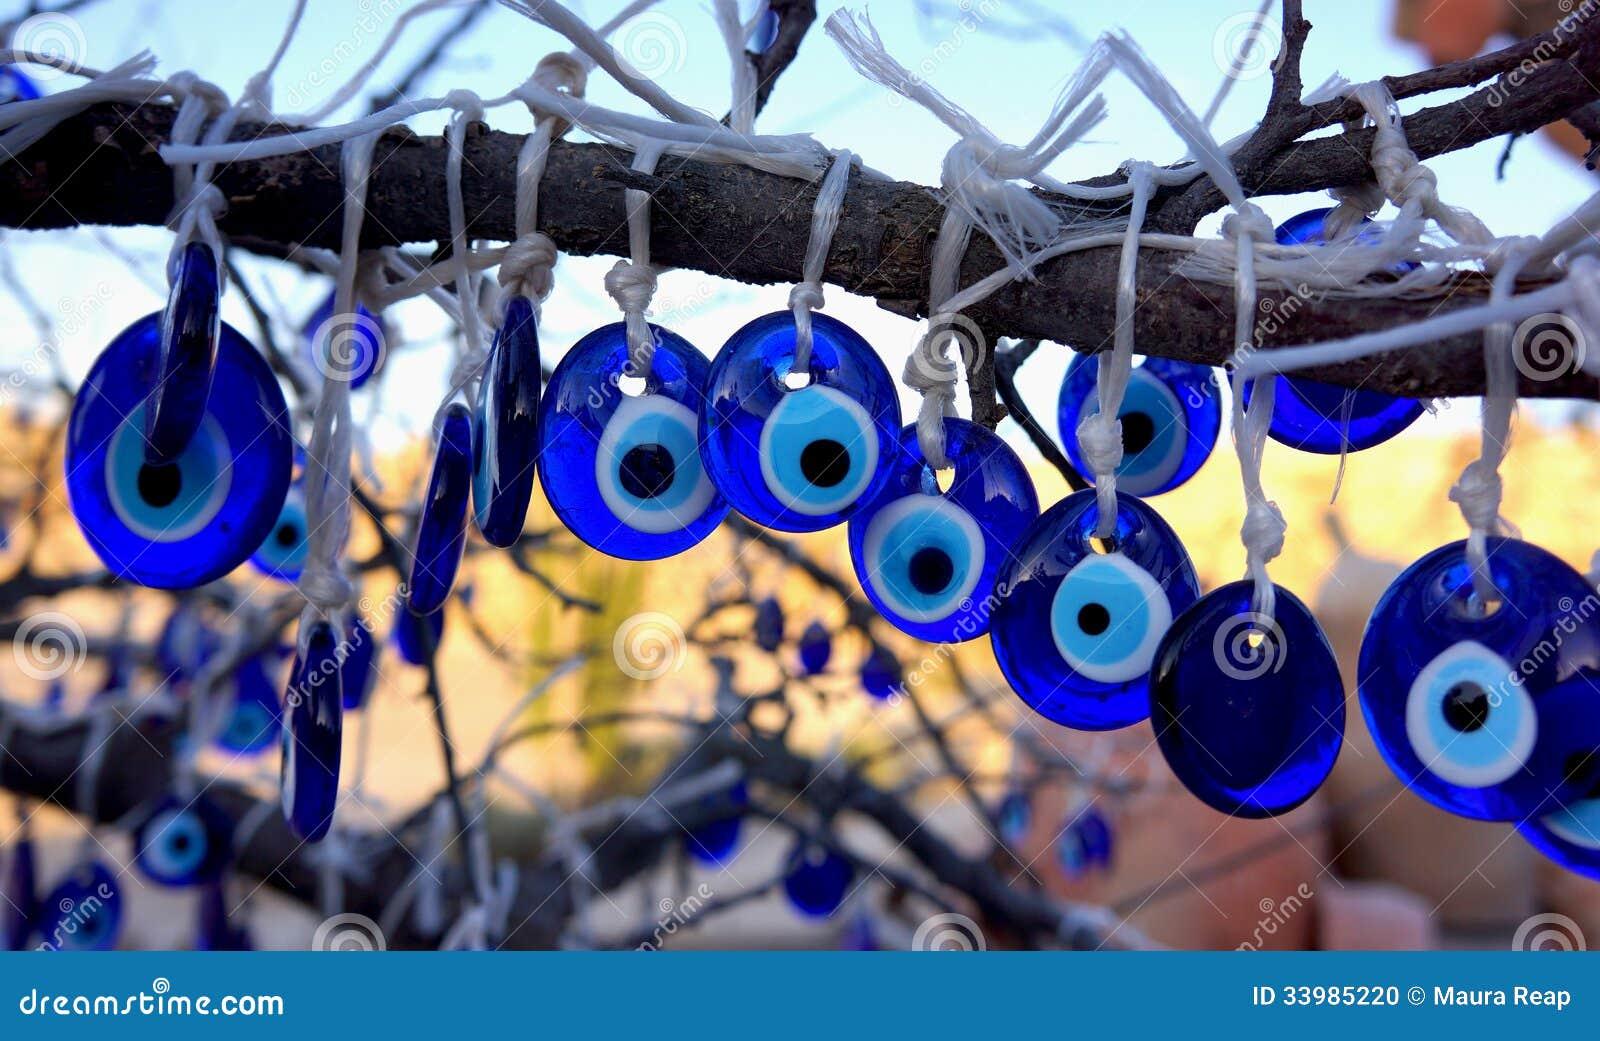 Symbols to ward off evil gallery symbol and sign ideas evil eye tree stock photo image of tourism travel superstition evil eye tree buycottarizona buycottarizona